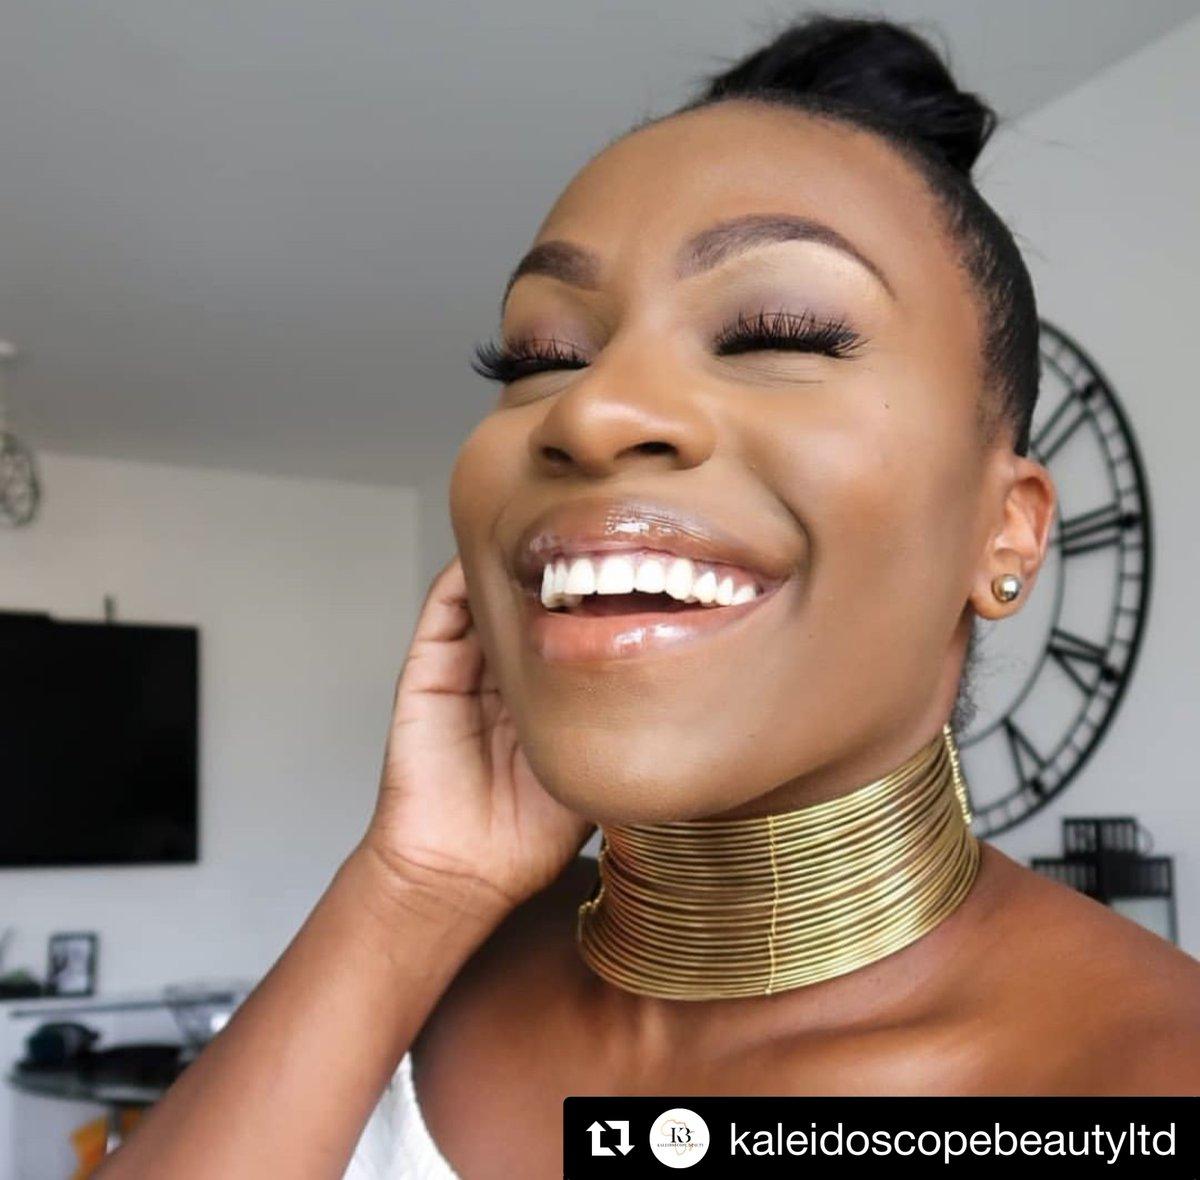 Some wholesome energy to start the week.  #HappyMonday #KBFamily   Shop 🔗 in bio  #KaleidoscopeBeauty #Iconic #SocialImpact #purposedriven #globalgoals  #instadaily #madeinkenya #Africa #Beauty #Inspiration #Jewellery #Art #Statement #Bold #MadeInAfrica #SustainableFashion https://t.co/VxnInPXm4d